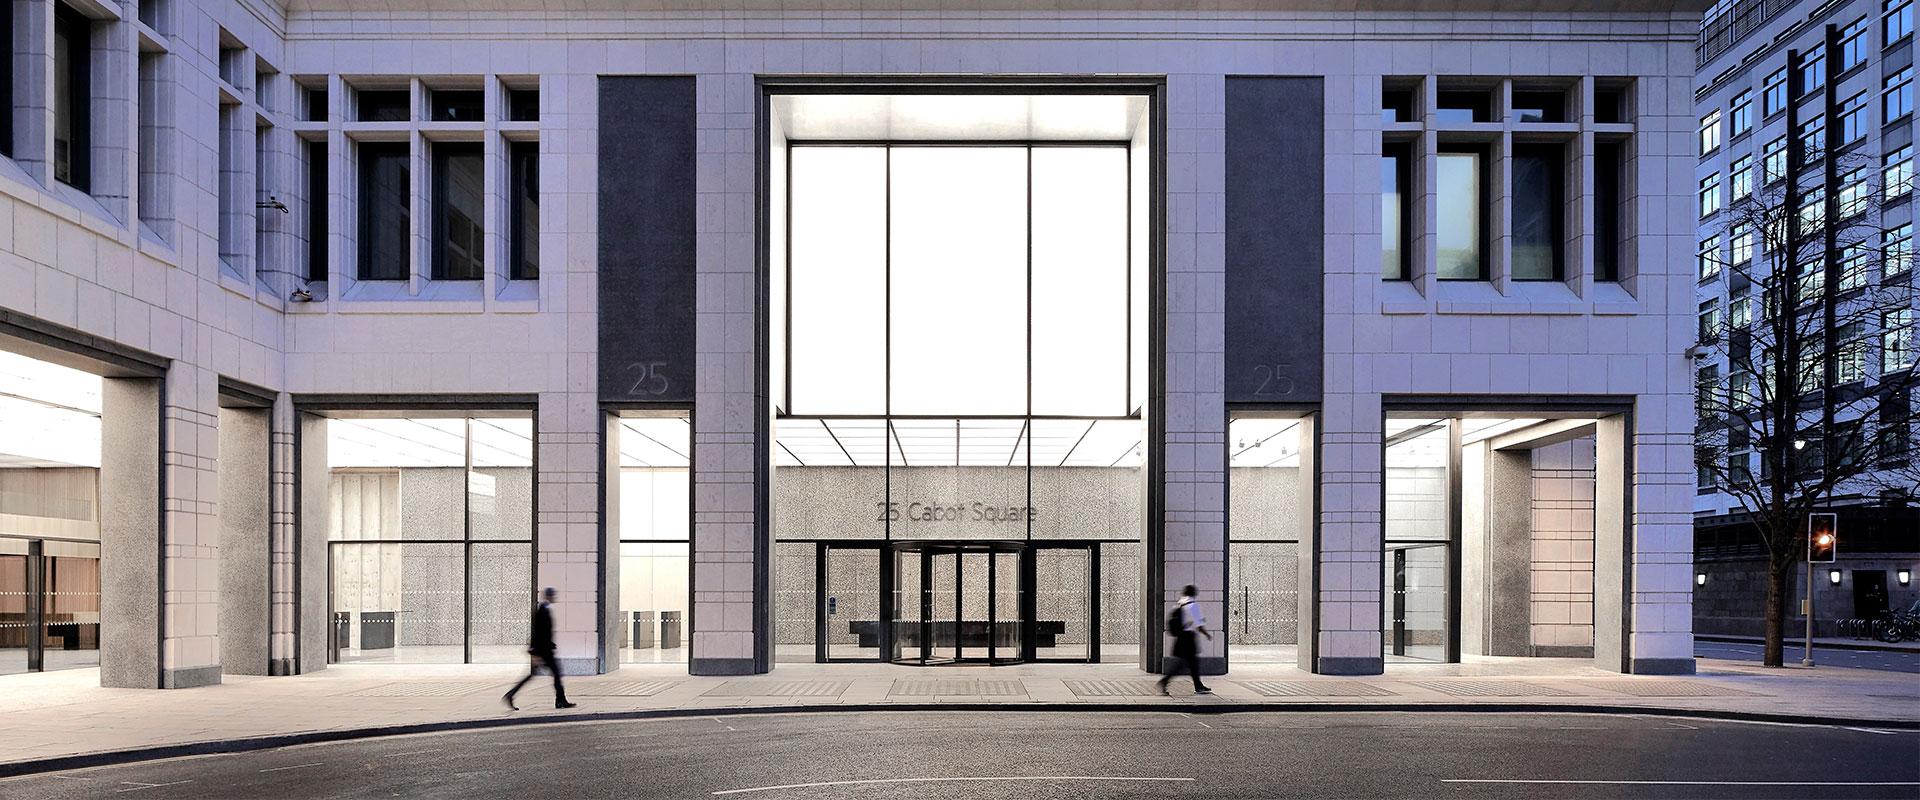 cabot-square---london-nited-kingdom---SB-260---centri-direzionali-15-OK